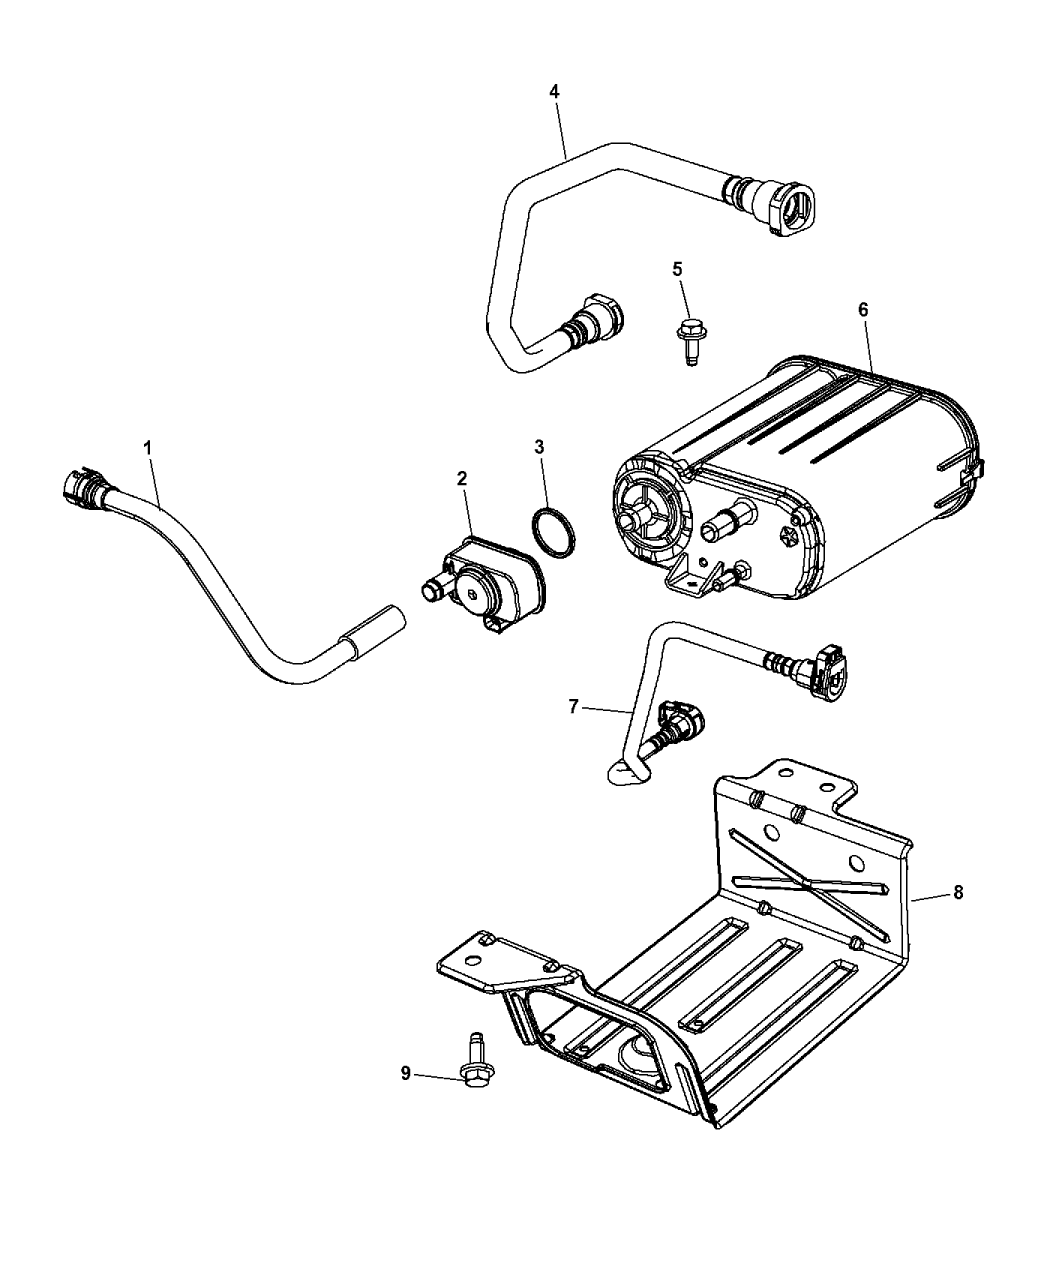 2017 Jeep Wrangler Vapor Canister & Leak Detection Pump